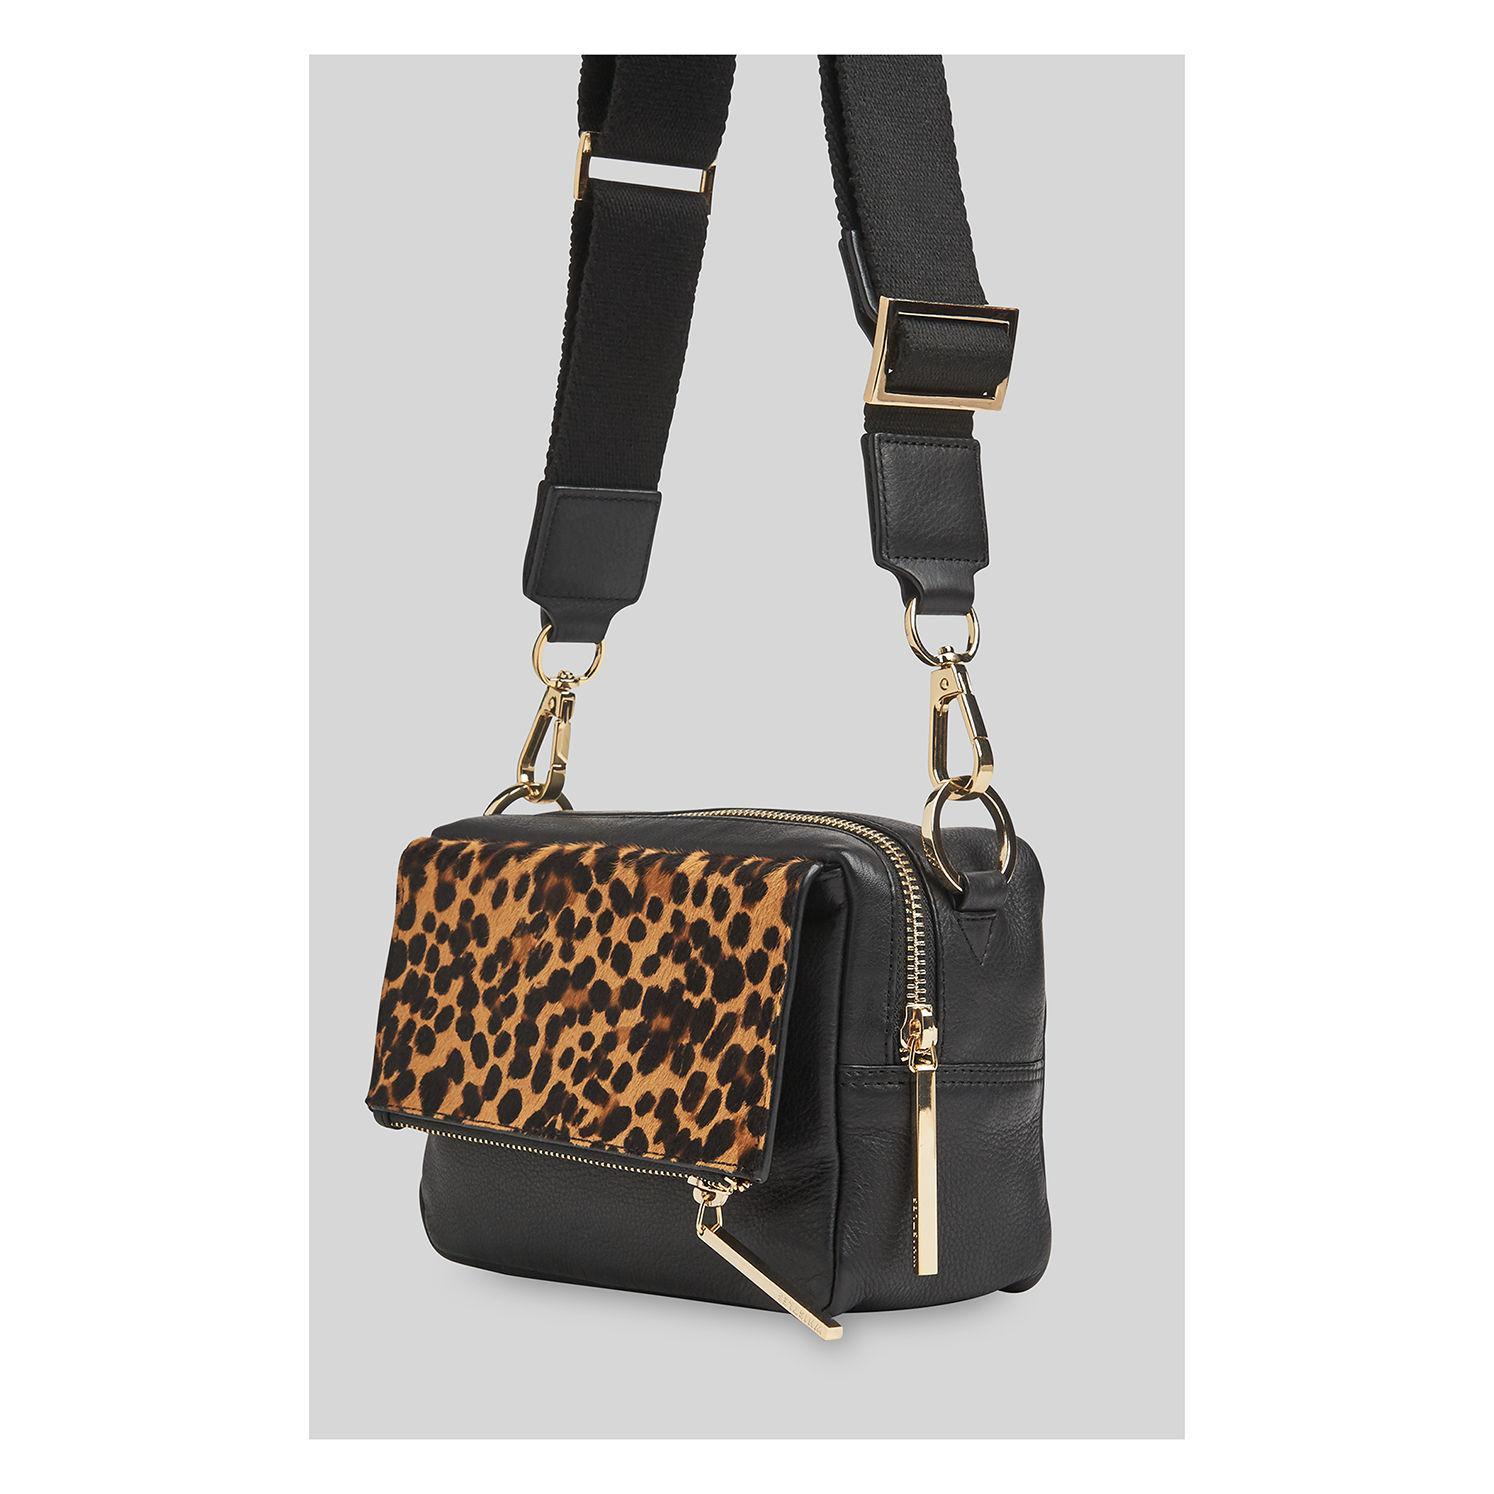 01159924cde1 Whistles Bibi Leopard Crossbody Bag in Black - Save 31% - Lyst